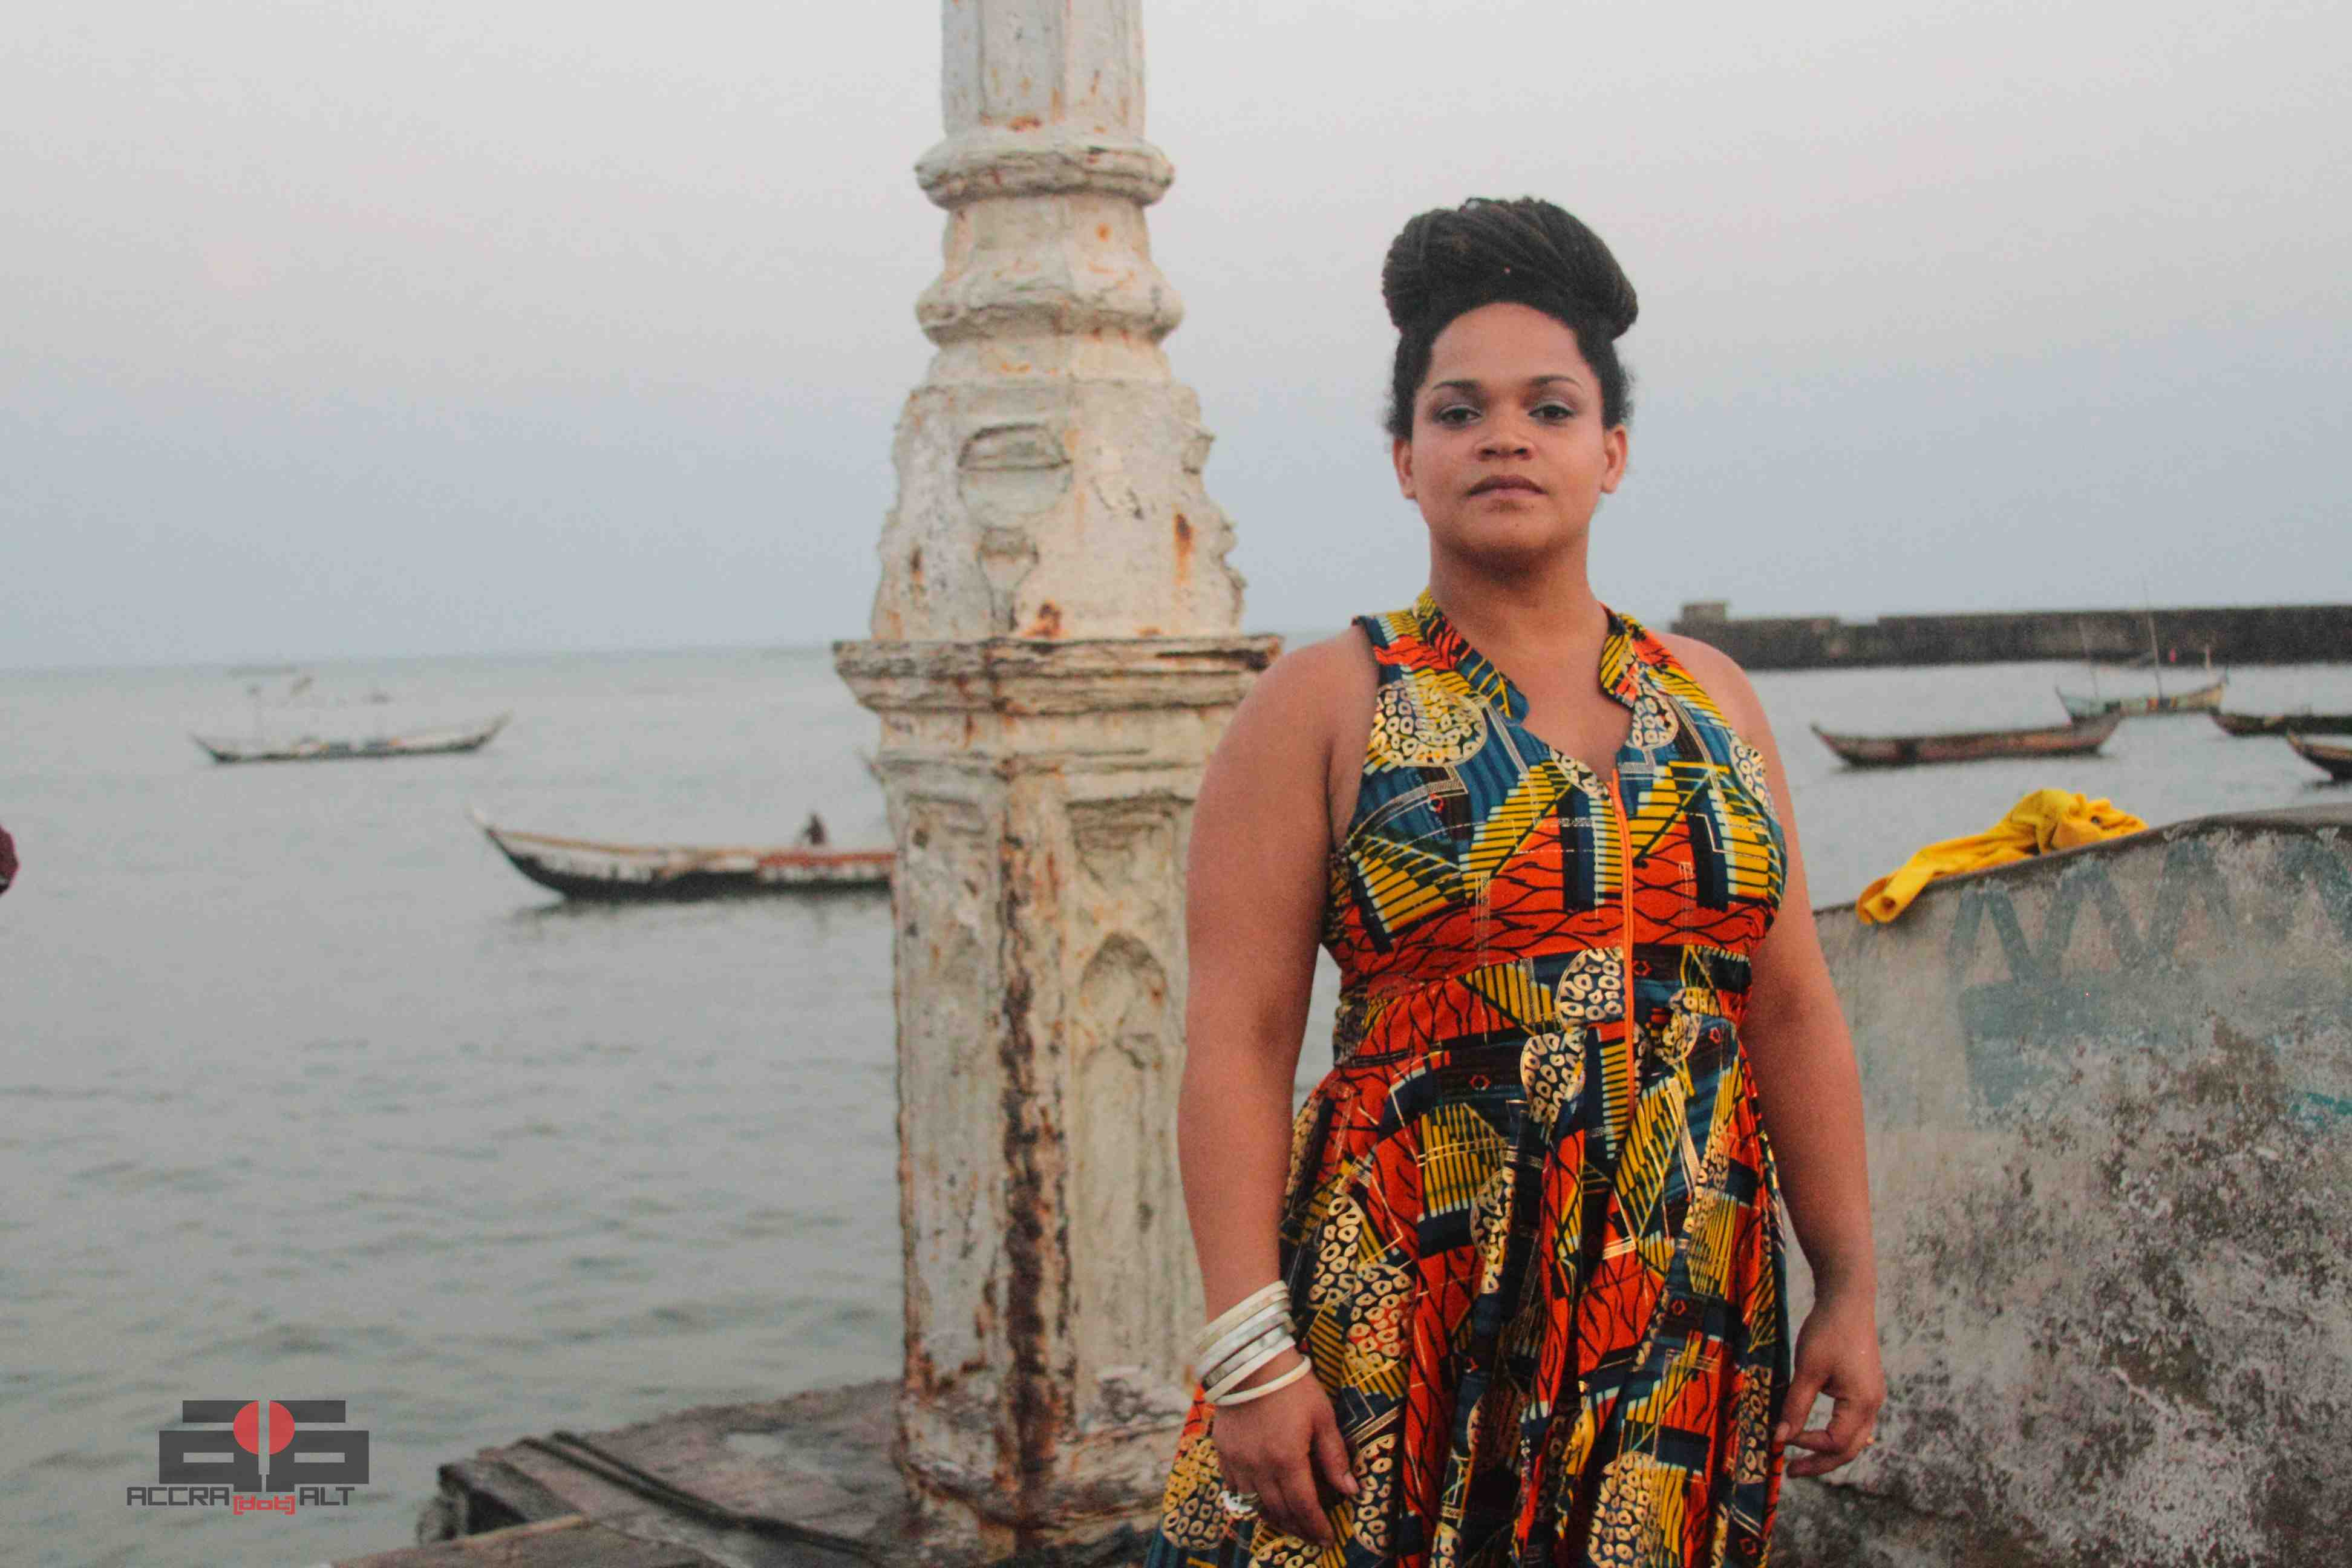 Sena Dagadu Pier13 - by Mantse Aryeequaye.TGD